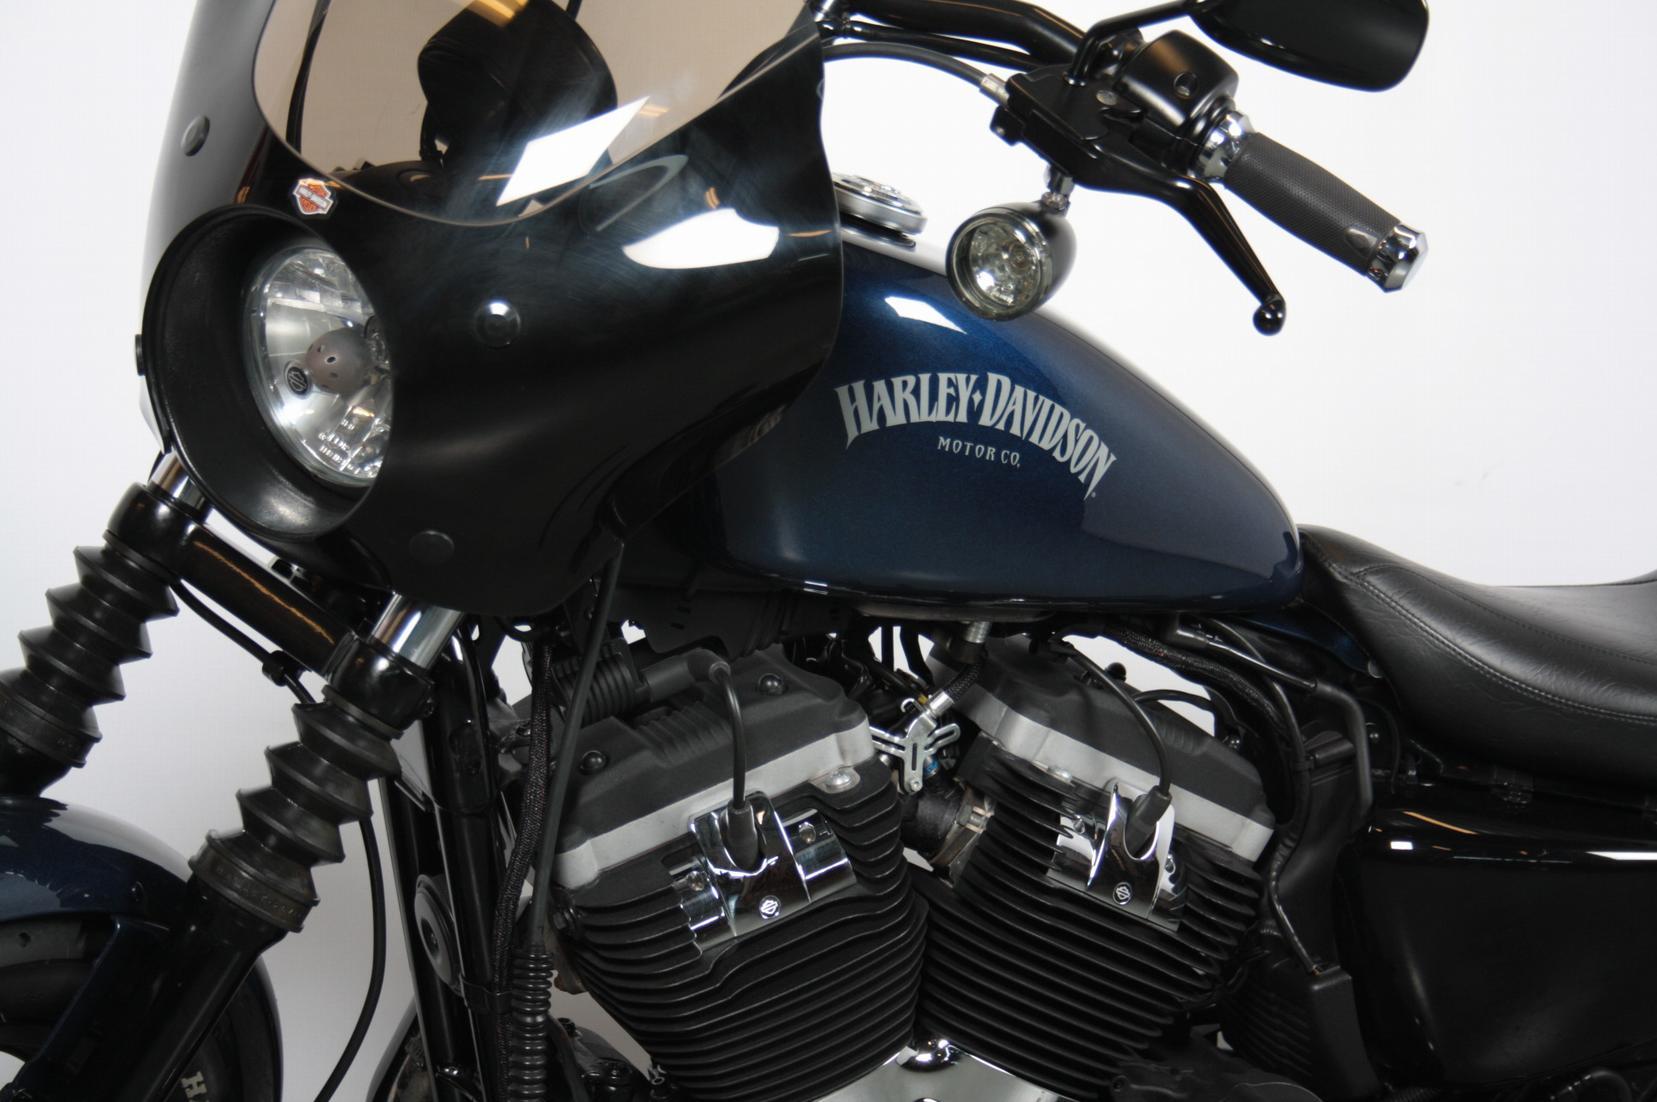 HARLEY-DAVIDSON - SPORTSTER 883 IRON